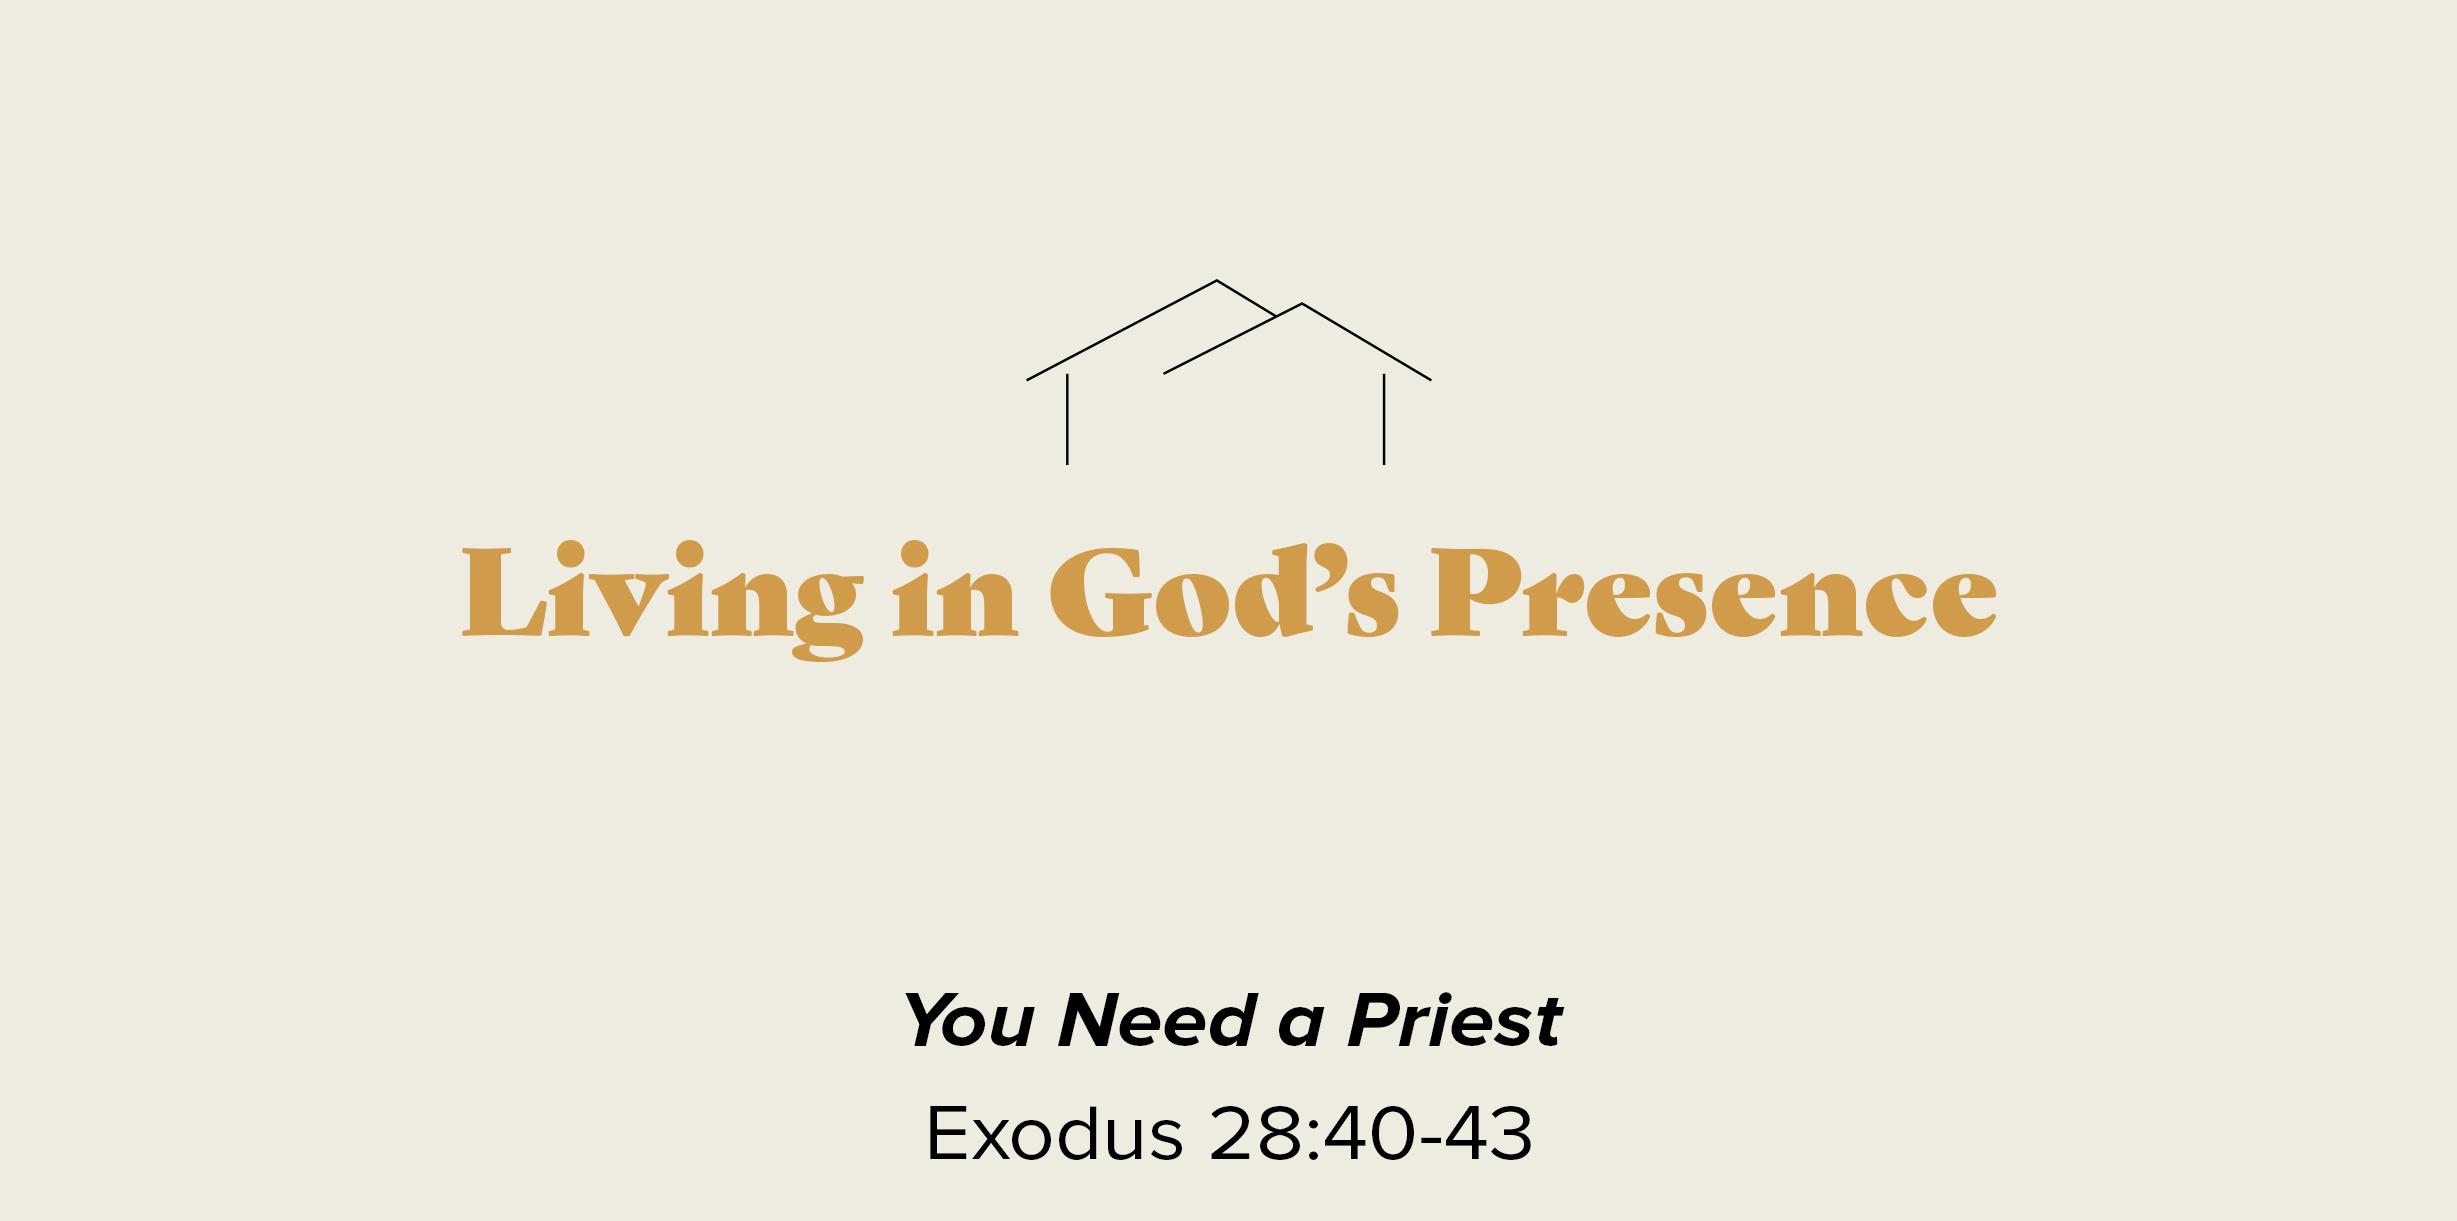 You-Need-A-Priest copy.jpg